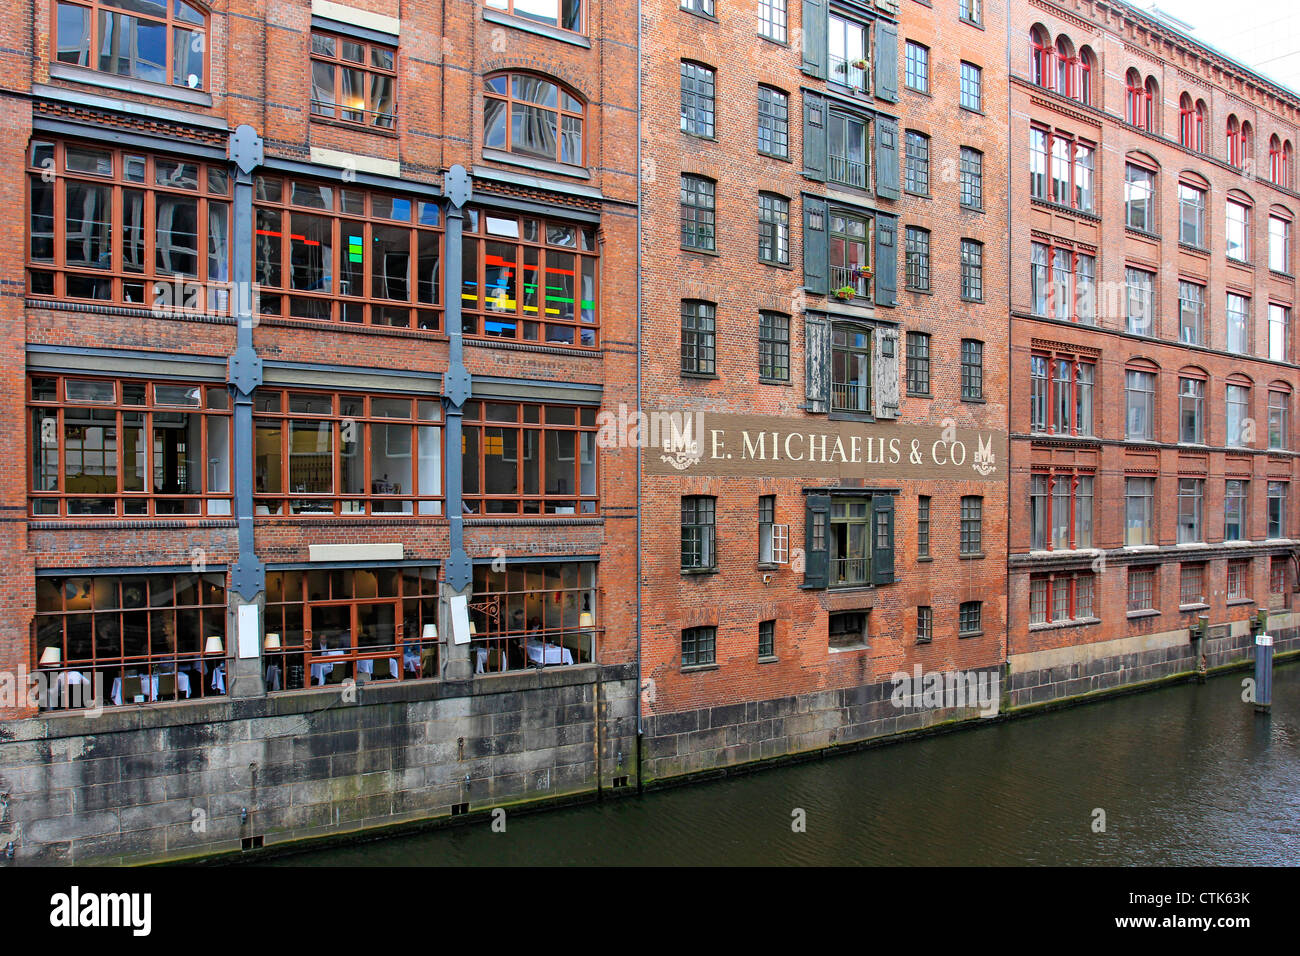 Germany, Hanseatic City Hamburg, Brick building on a Fleet - Stock Image